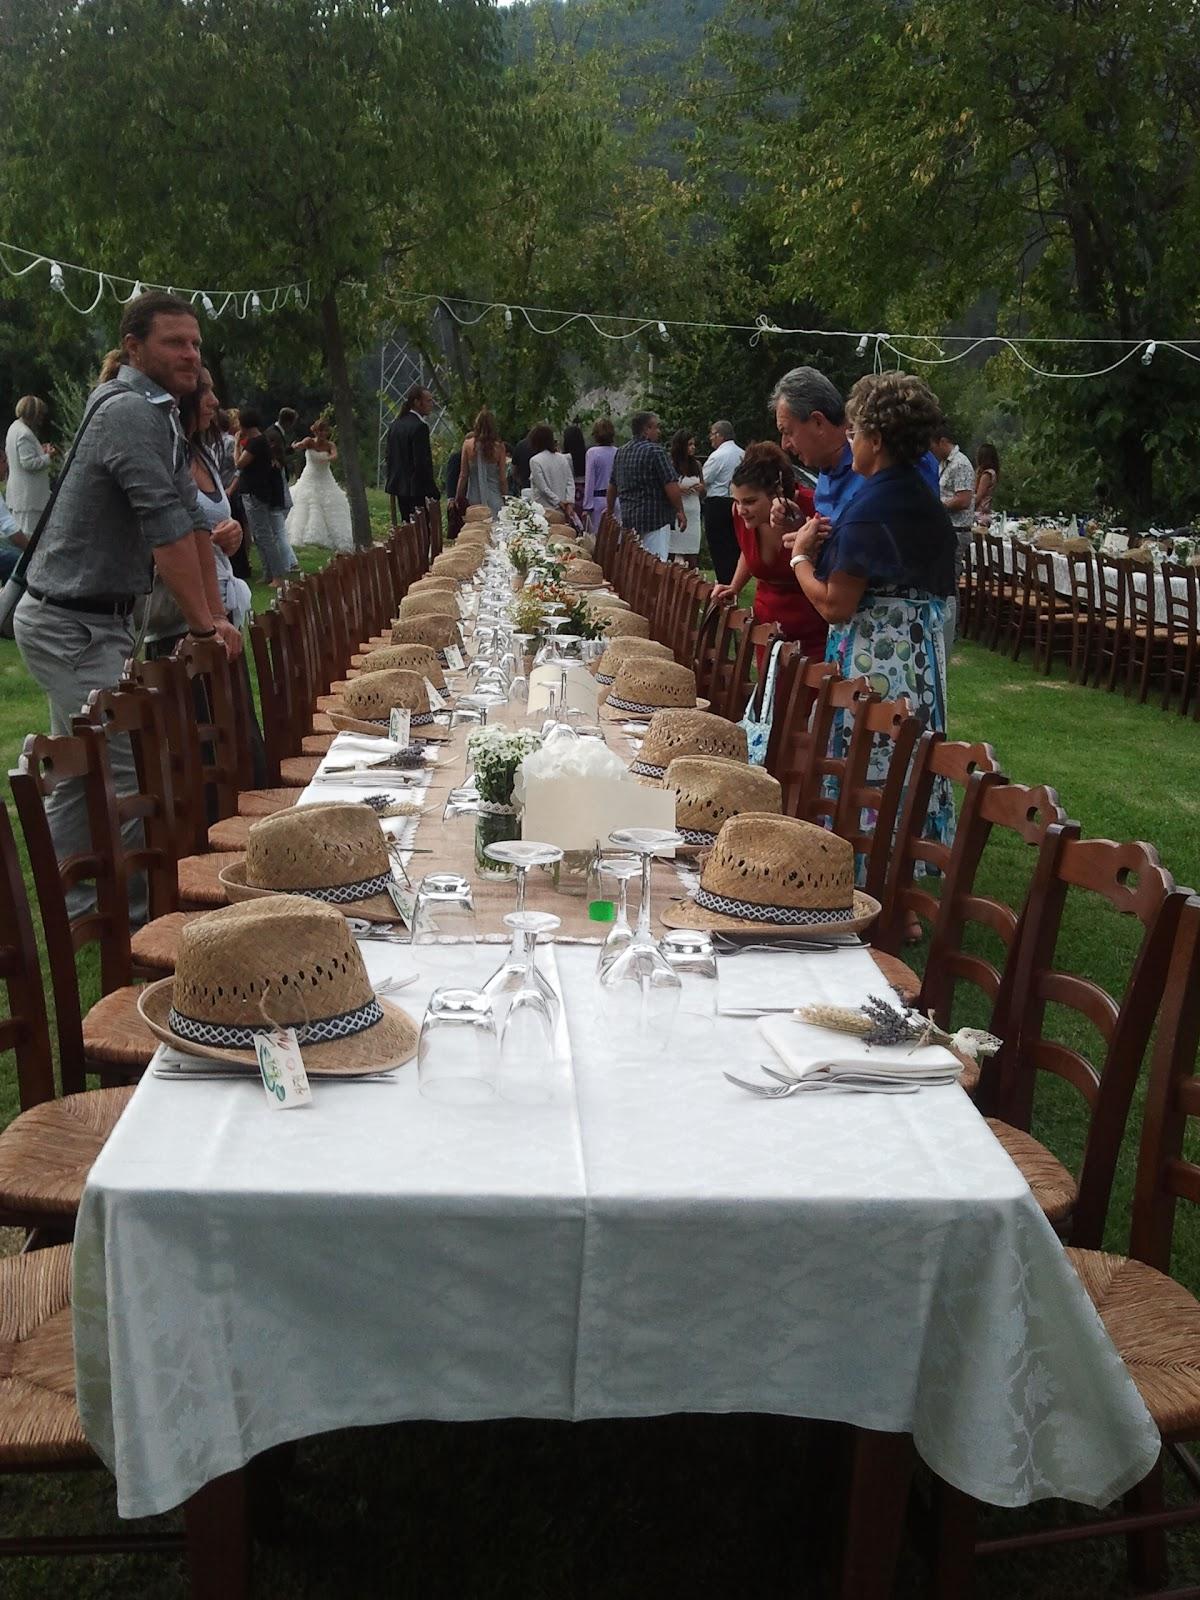 Allestimento Matrimonio Stile Country Chic : Mareventi wedding planner ravenna allestimenti floreali